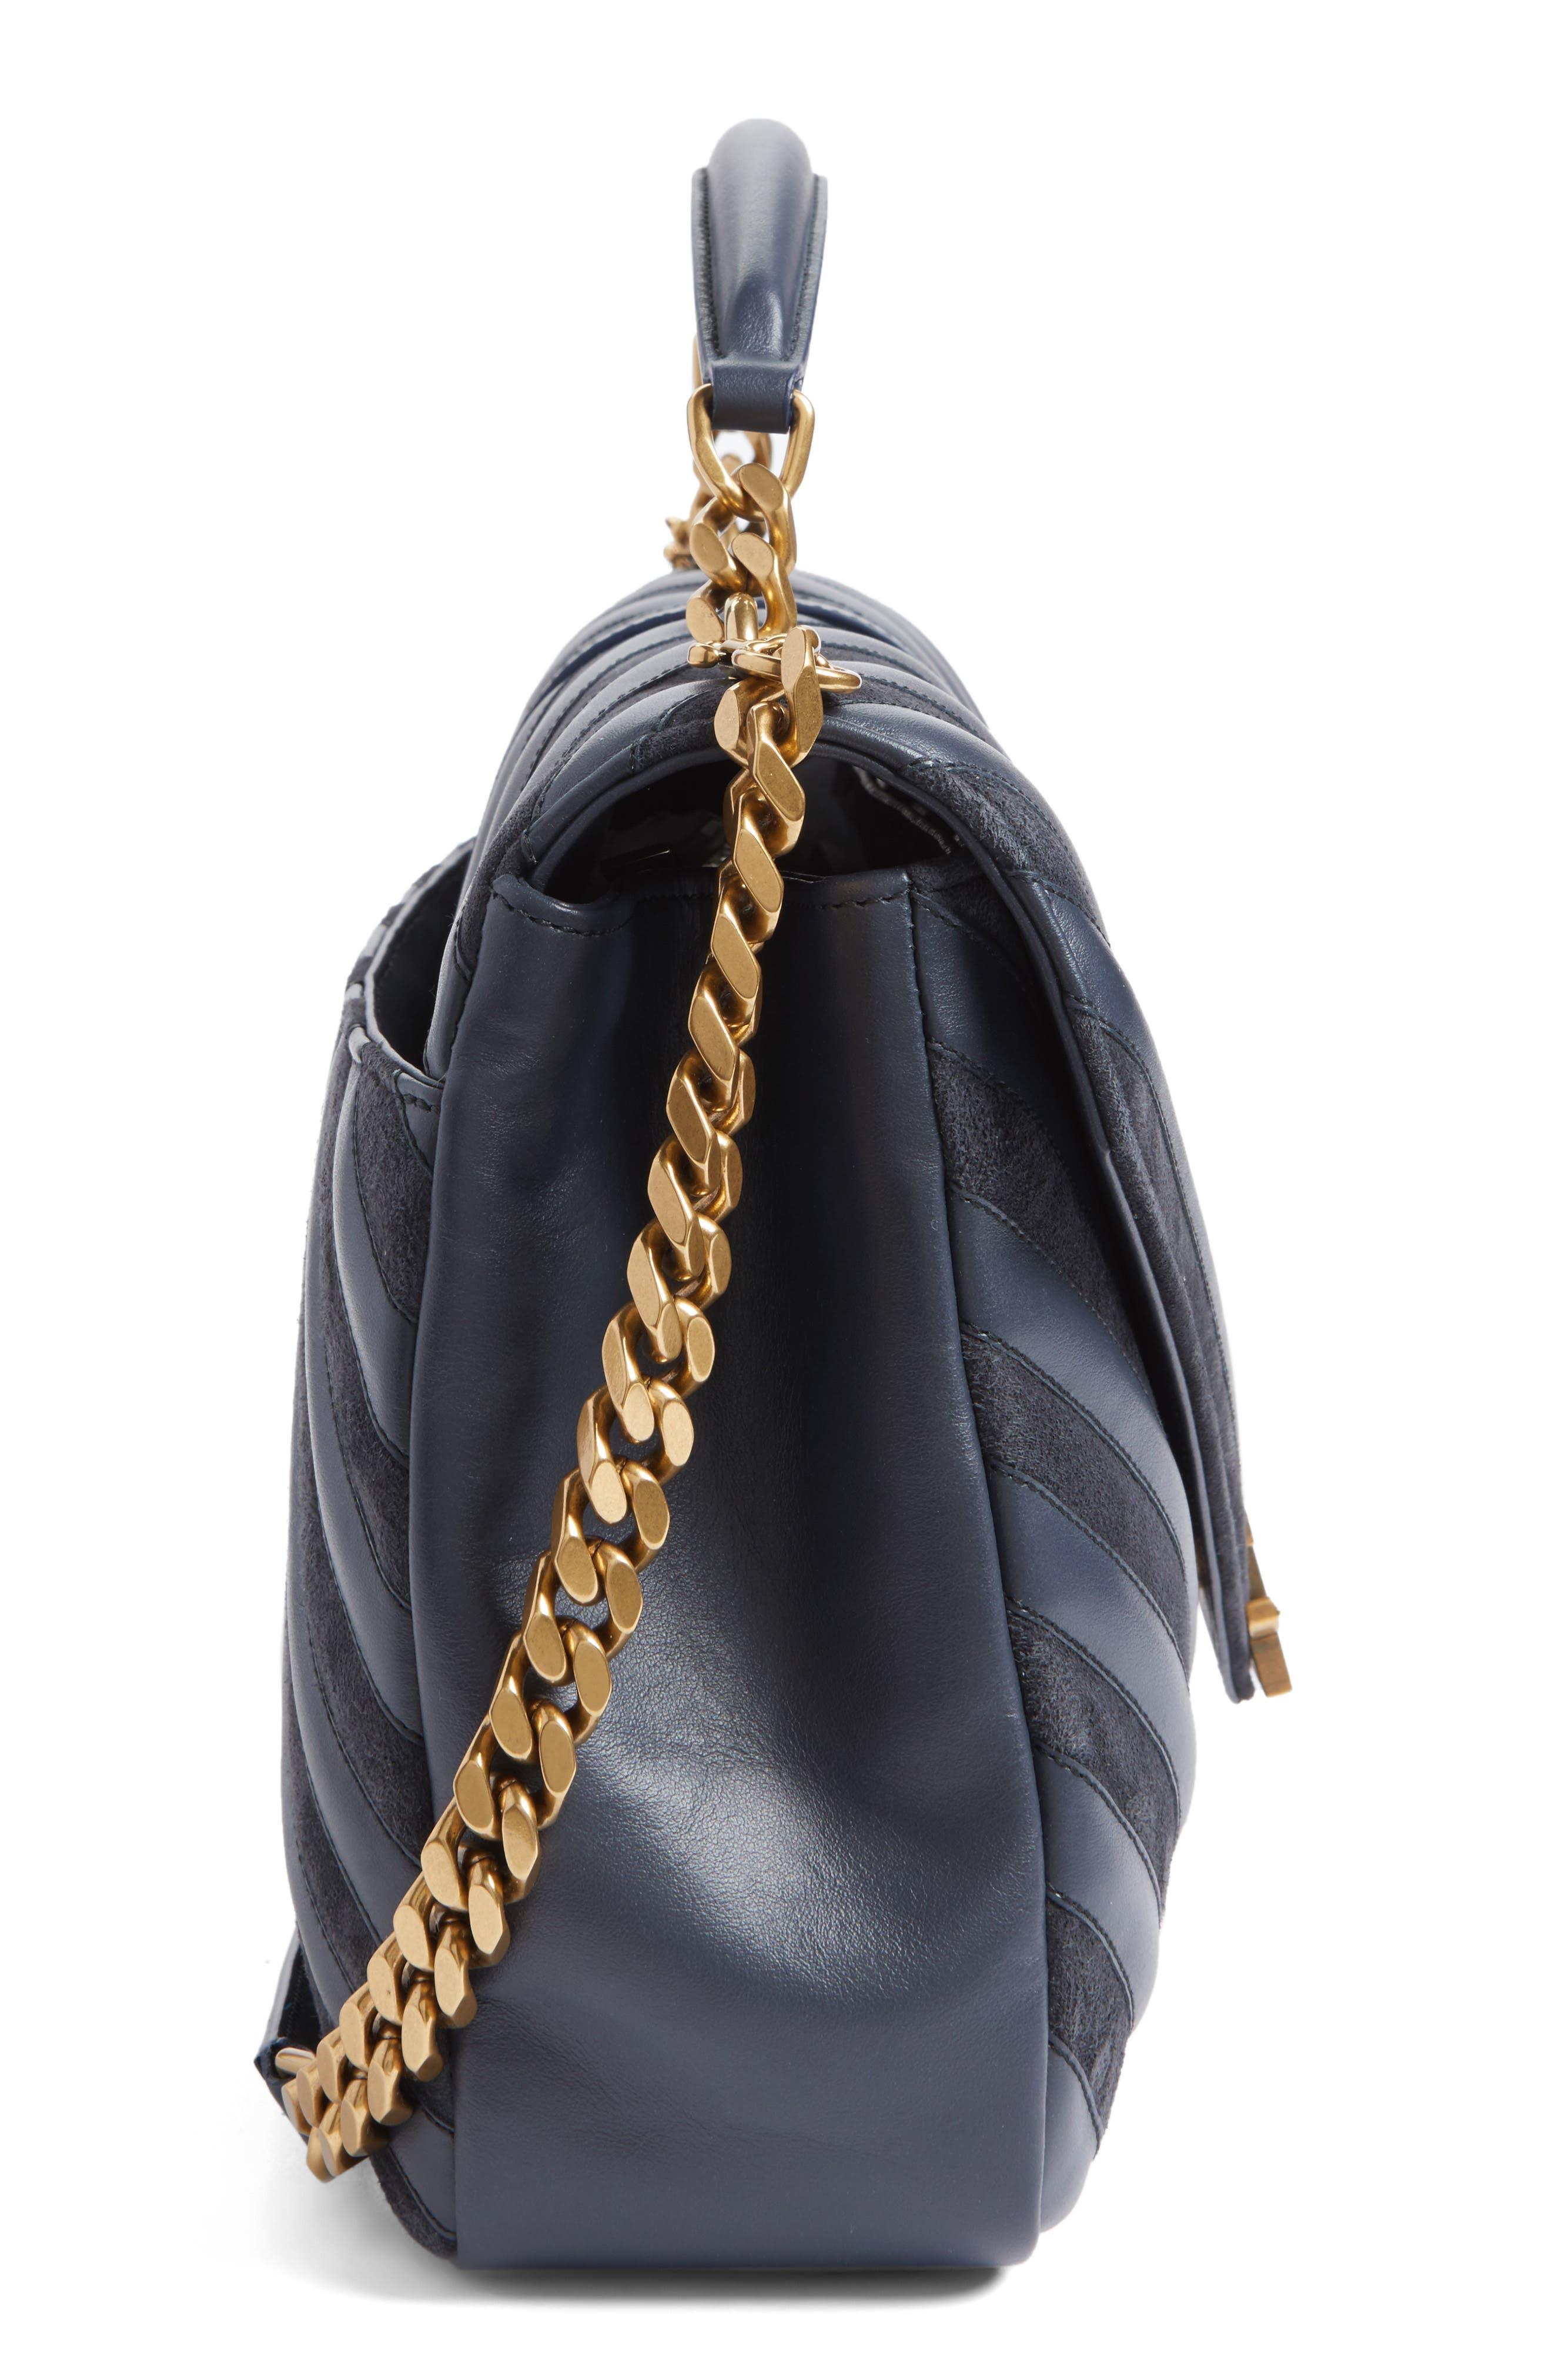 Medium College Patchwork Suede & Leather Shoulder Bag,                             Alternate thumbnail 5, color,                             Graphite